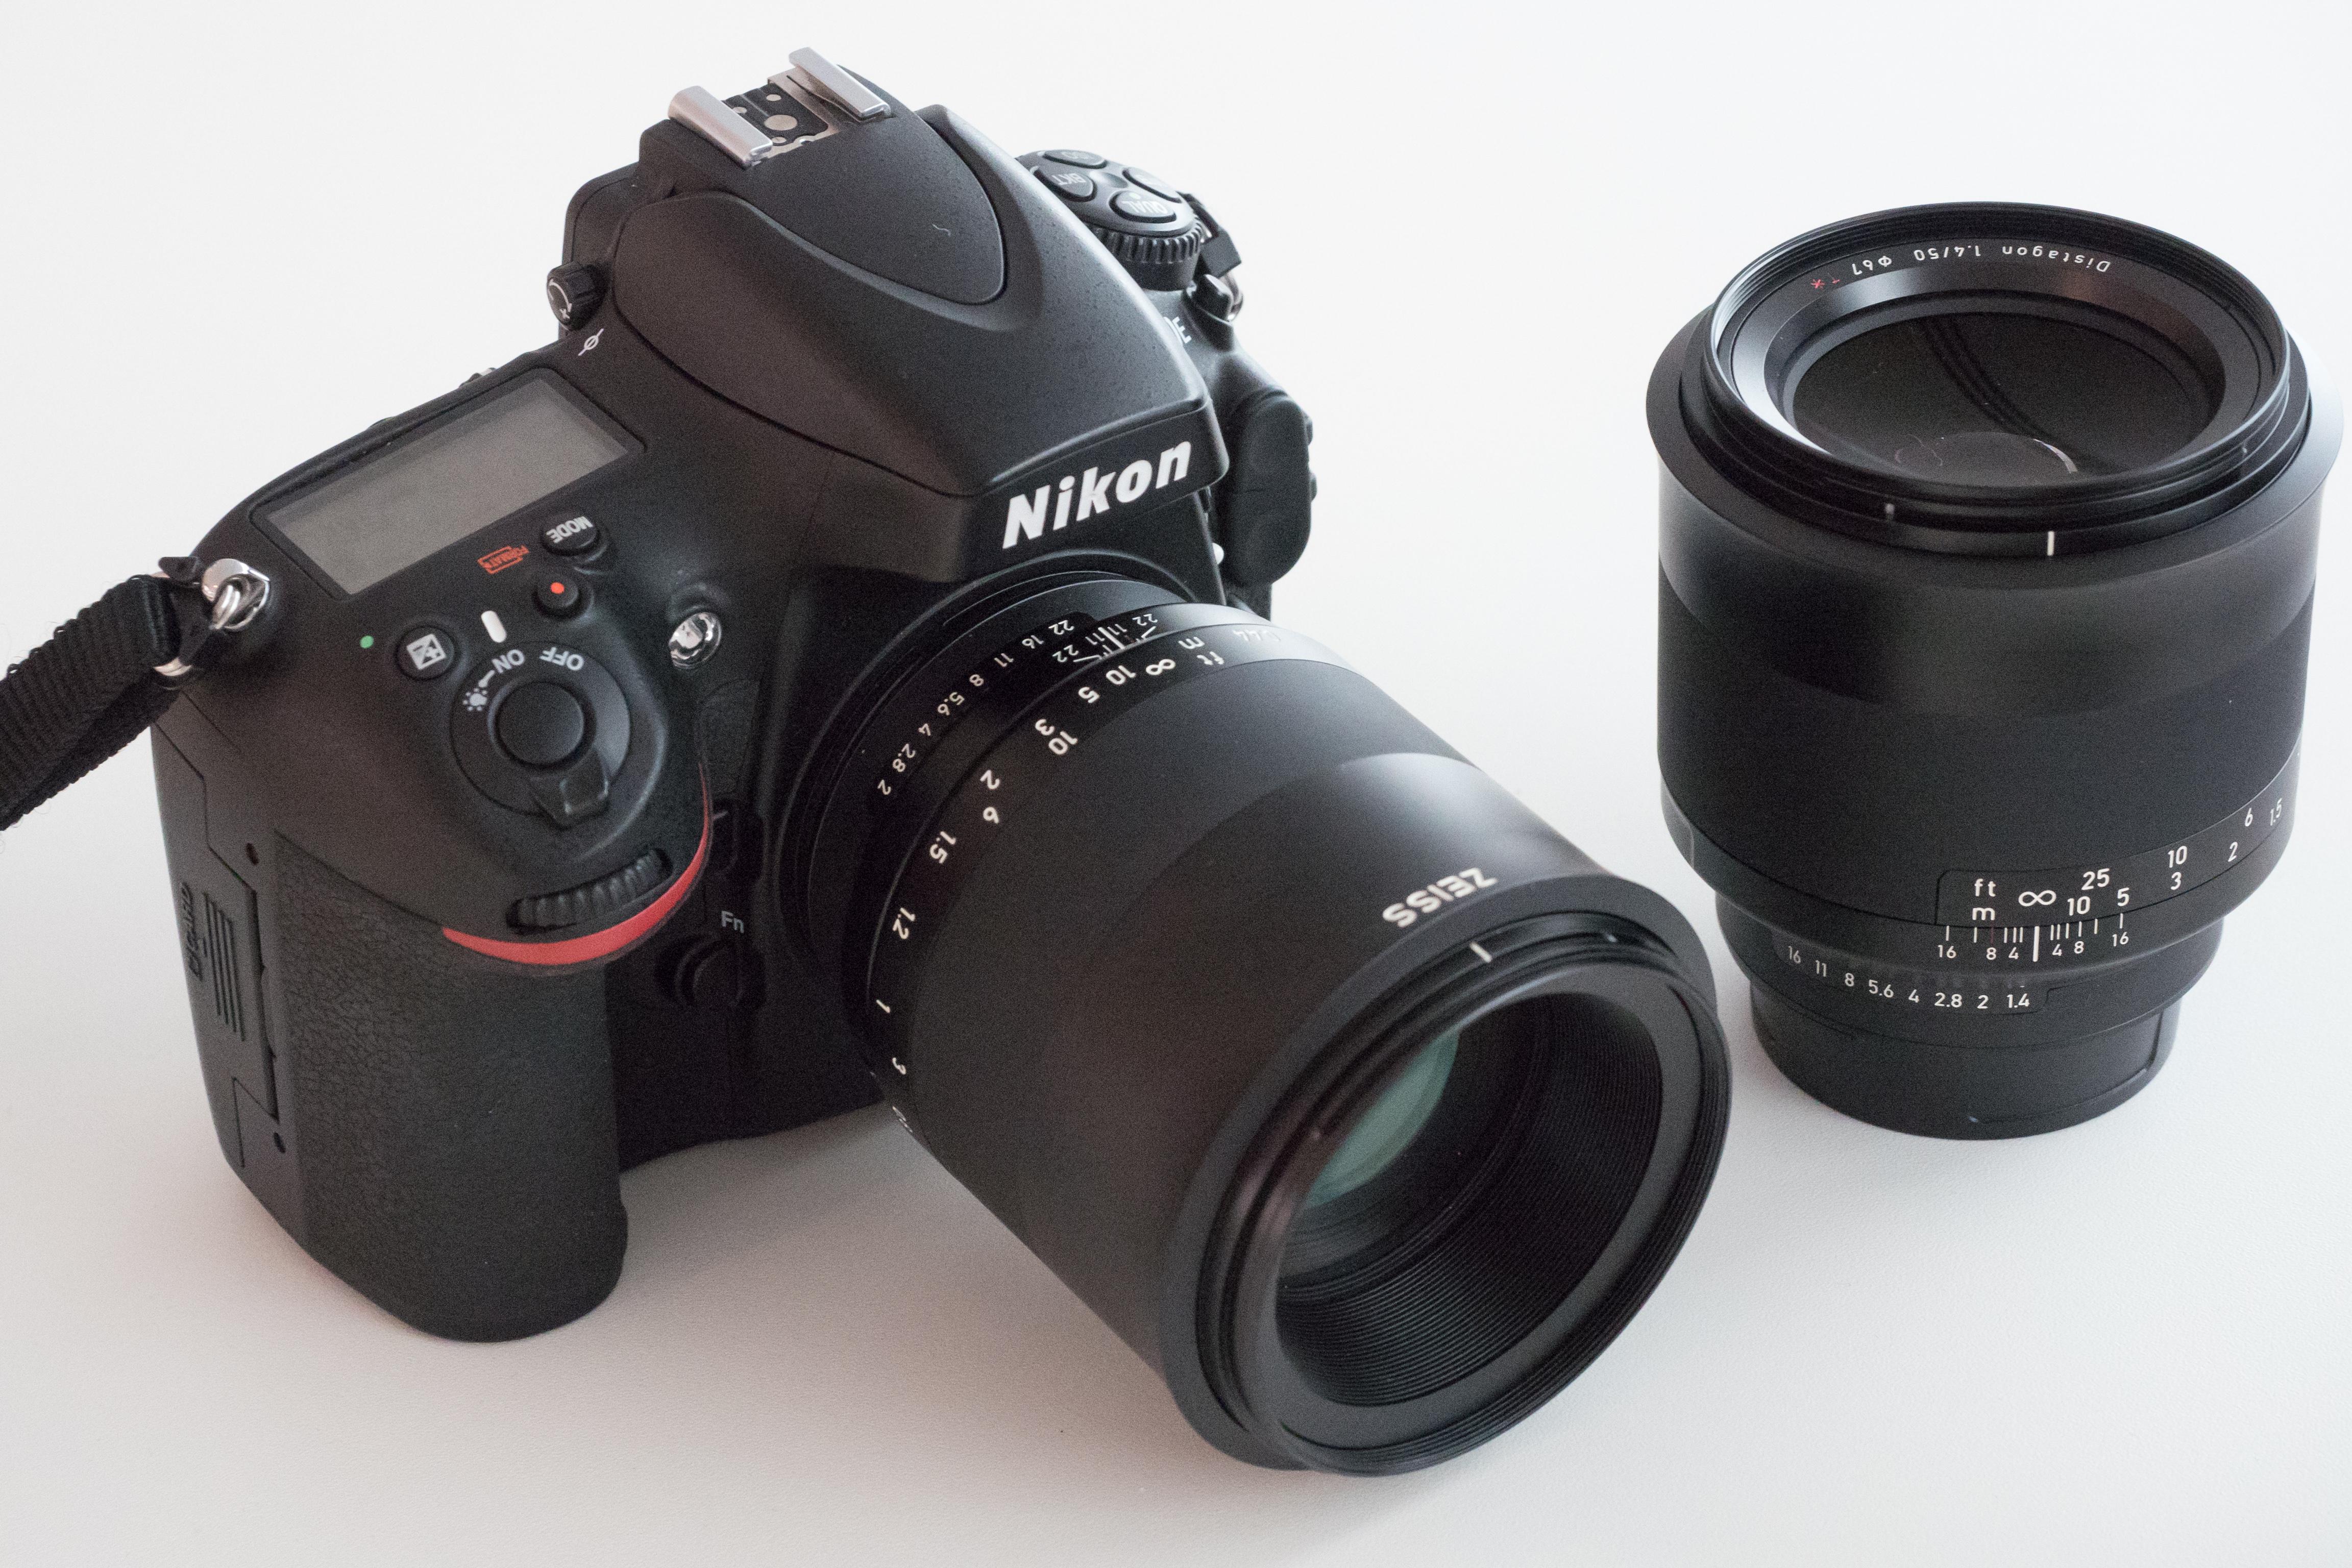 Zeiss Milvus lenses: Hands-on First Look - Amateur